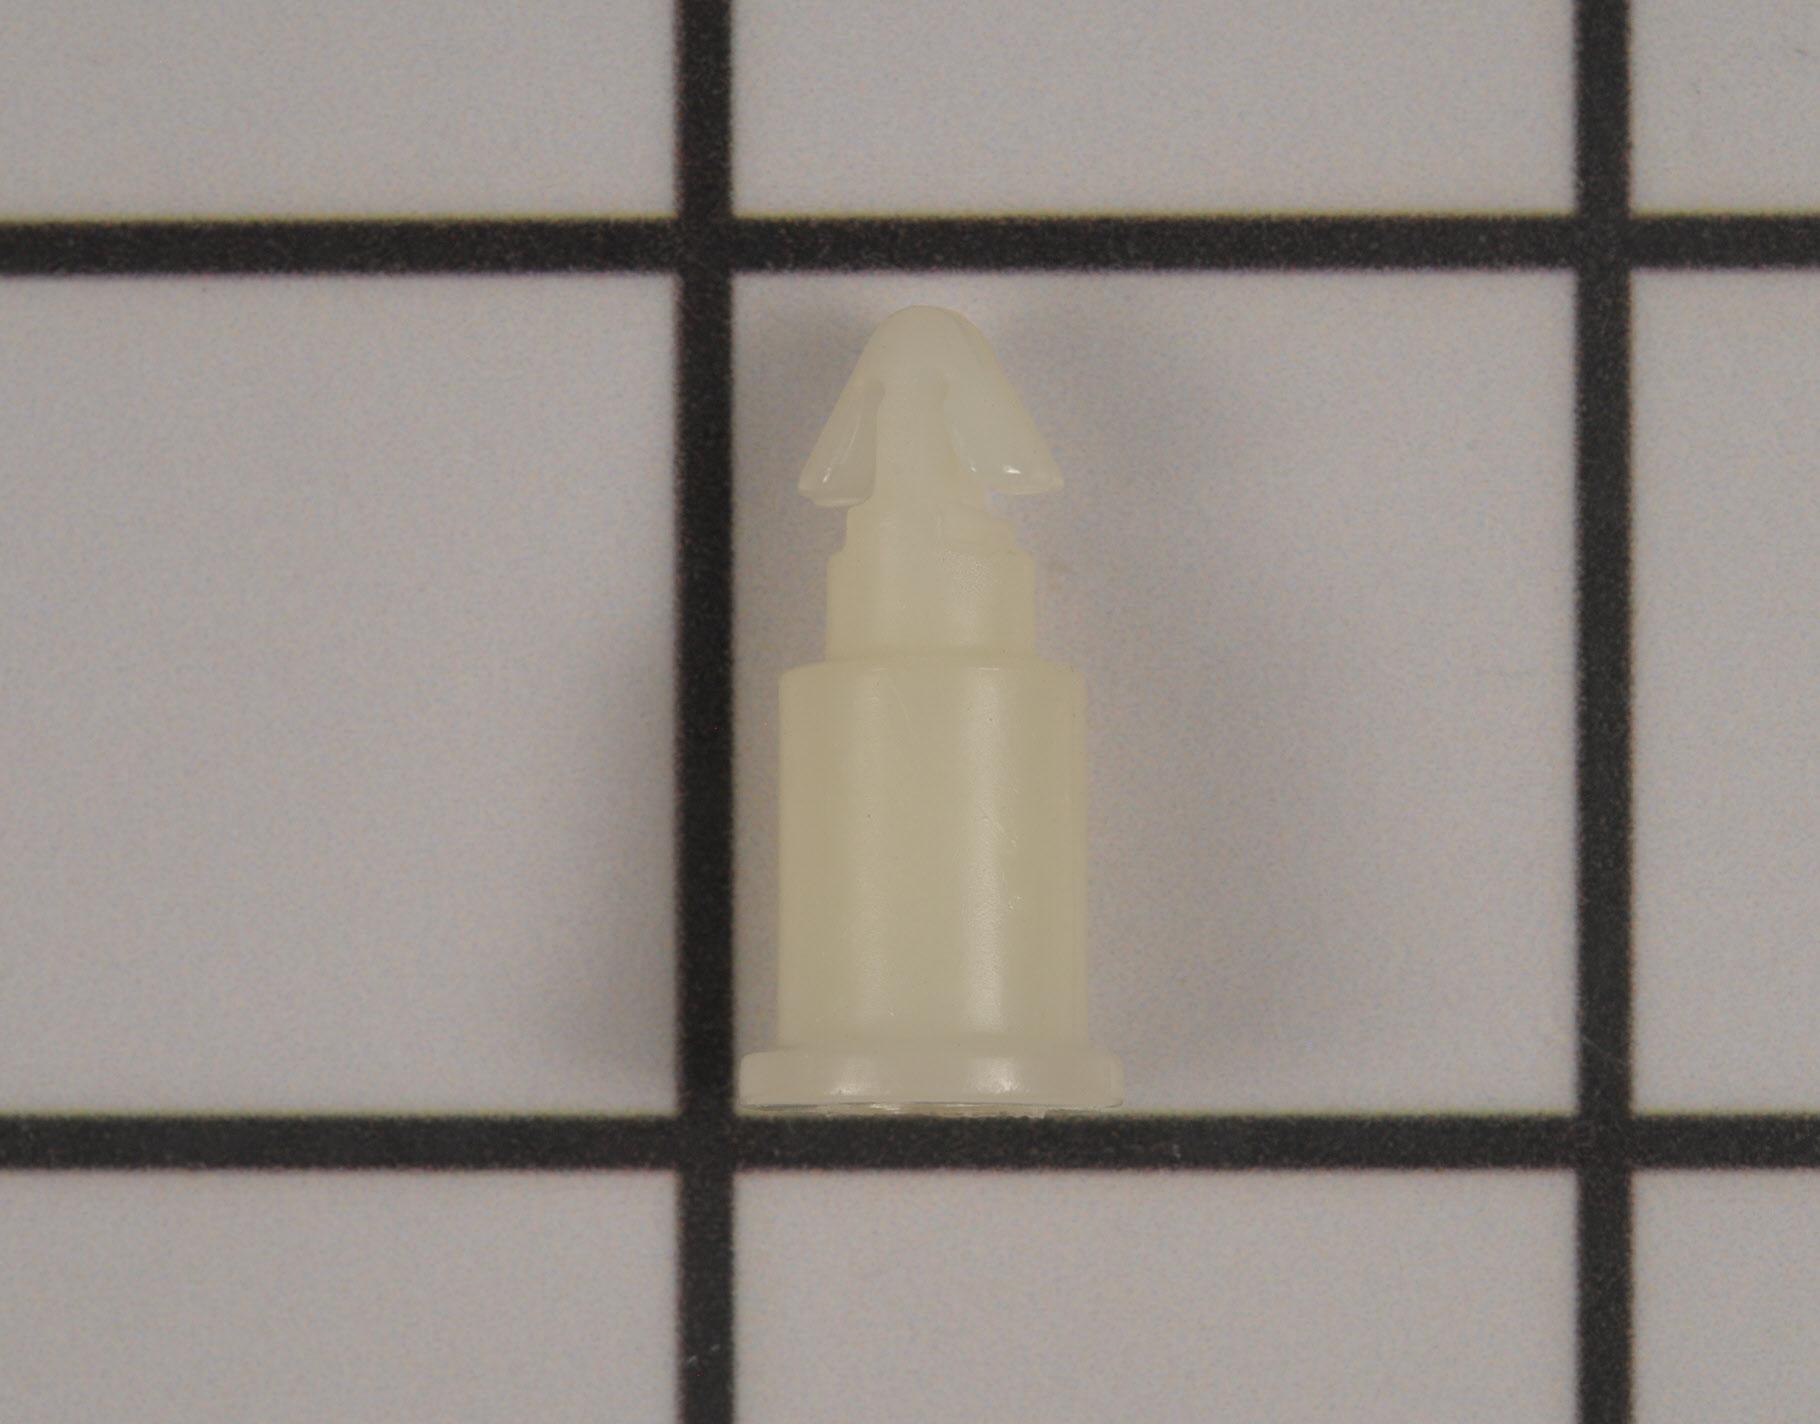 Maytag Refrigerator Part # WPW10257246 - Axle